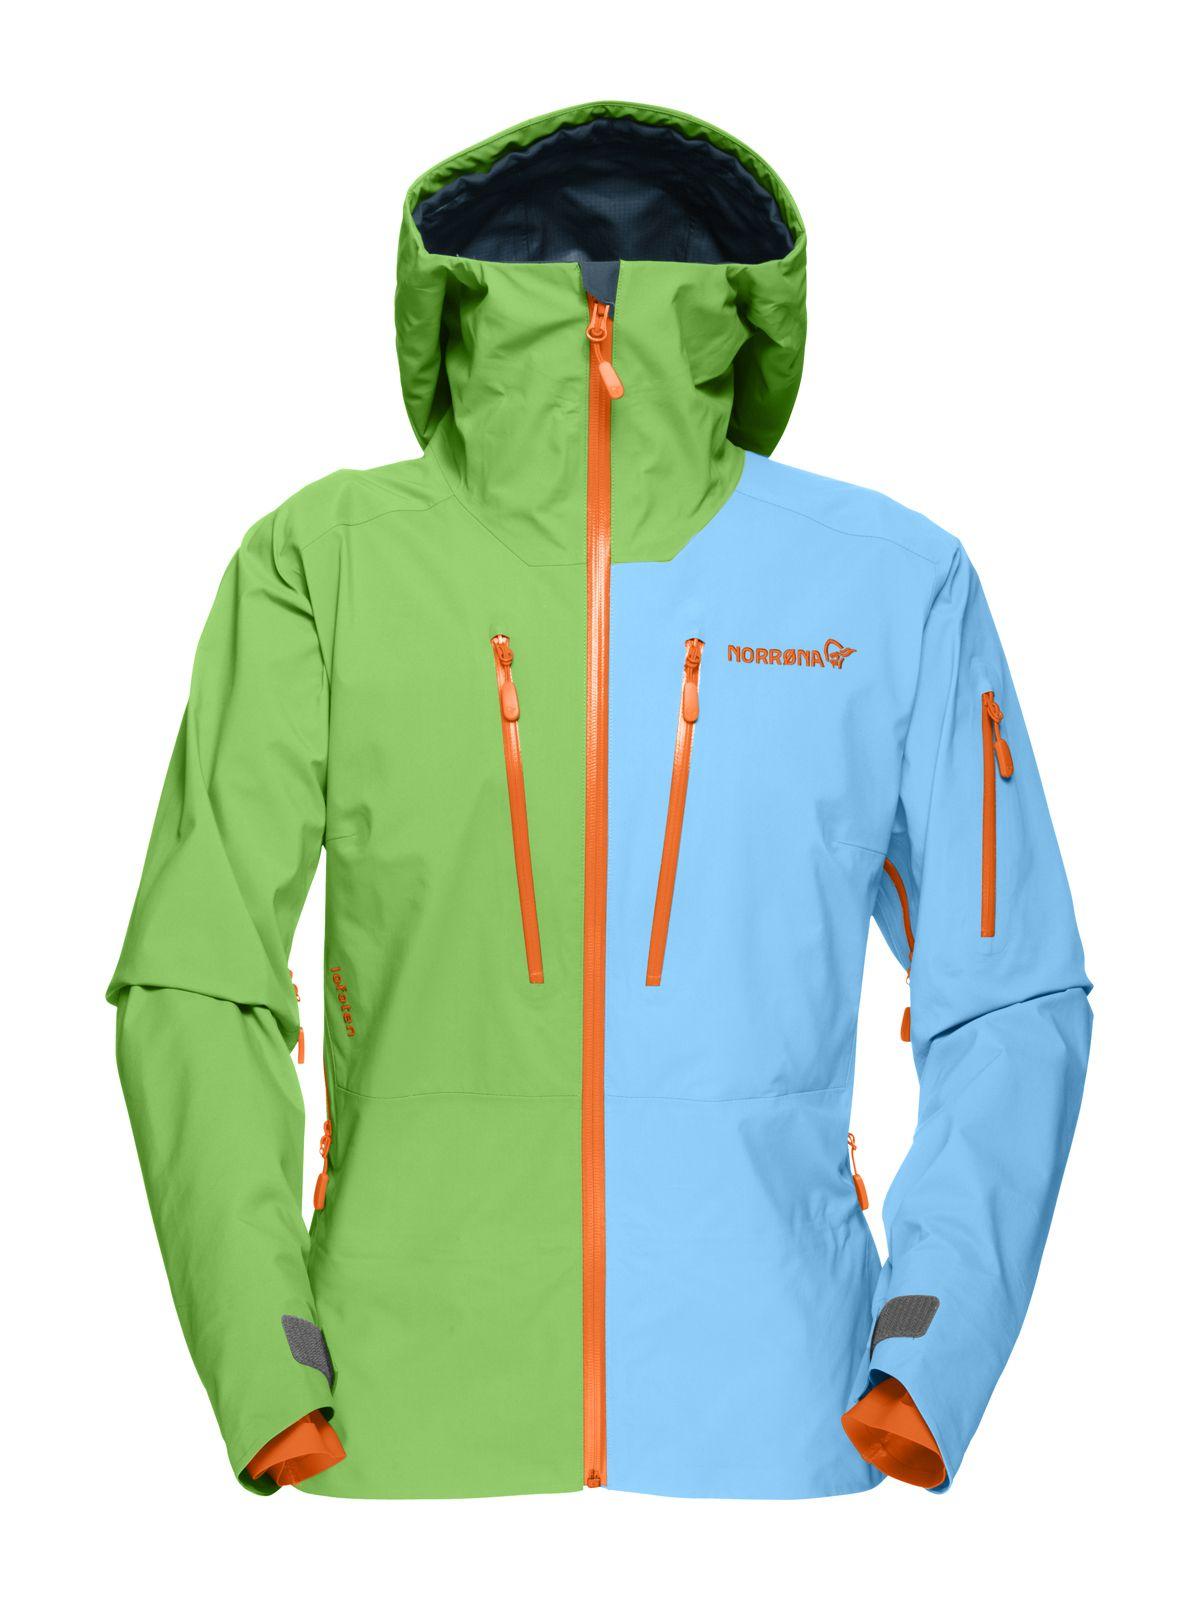 Norrona Norrona Women Lofoten Gore-Tex Pro Jacket b63f735b7